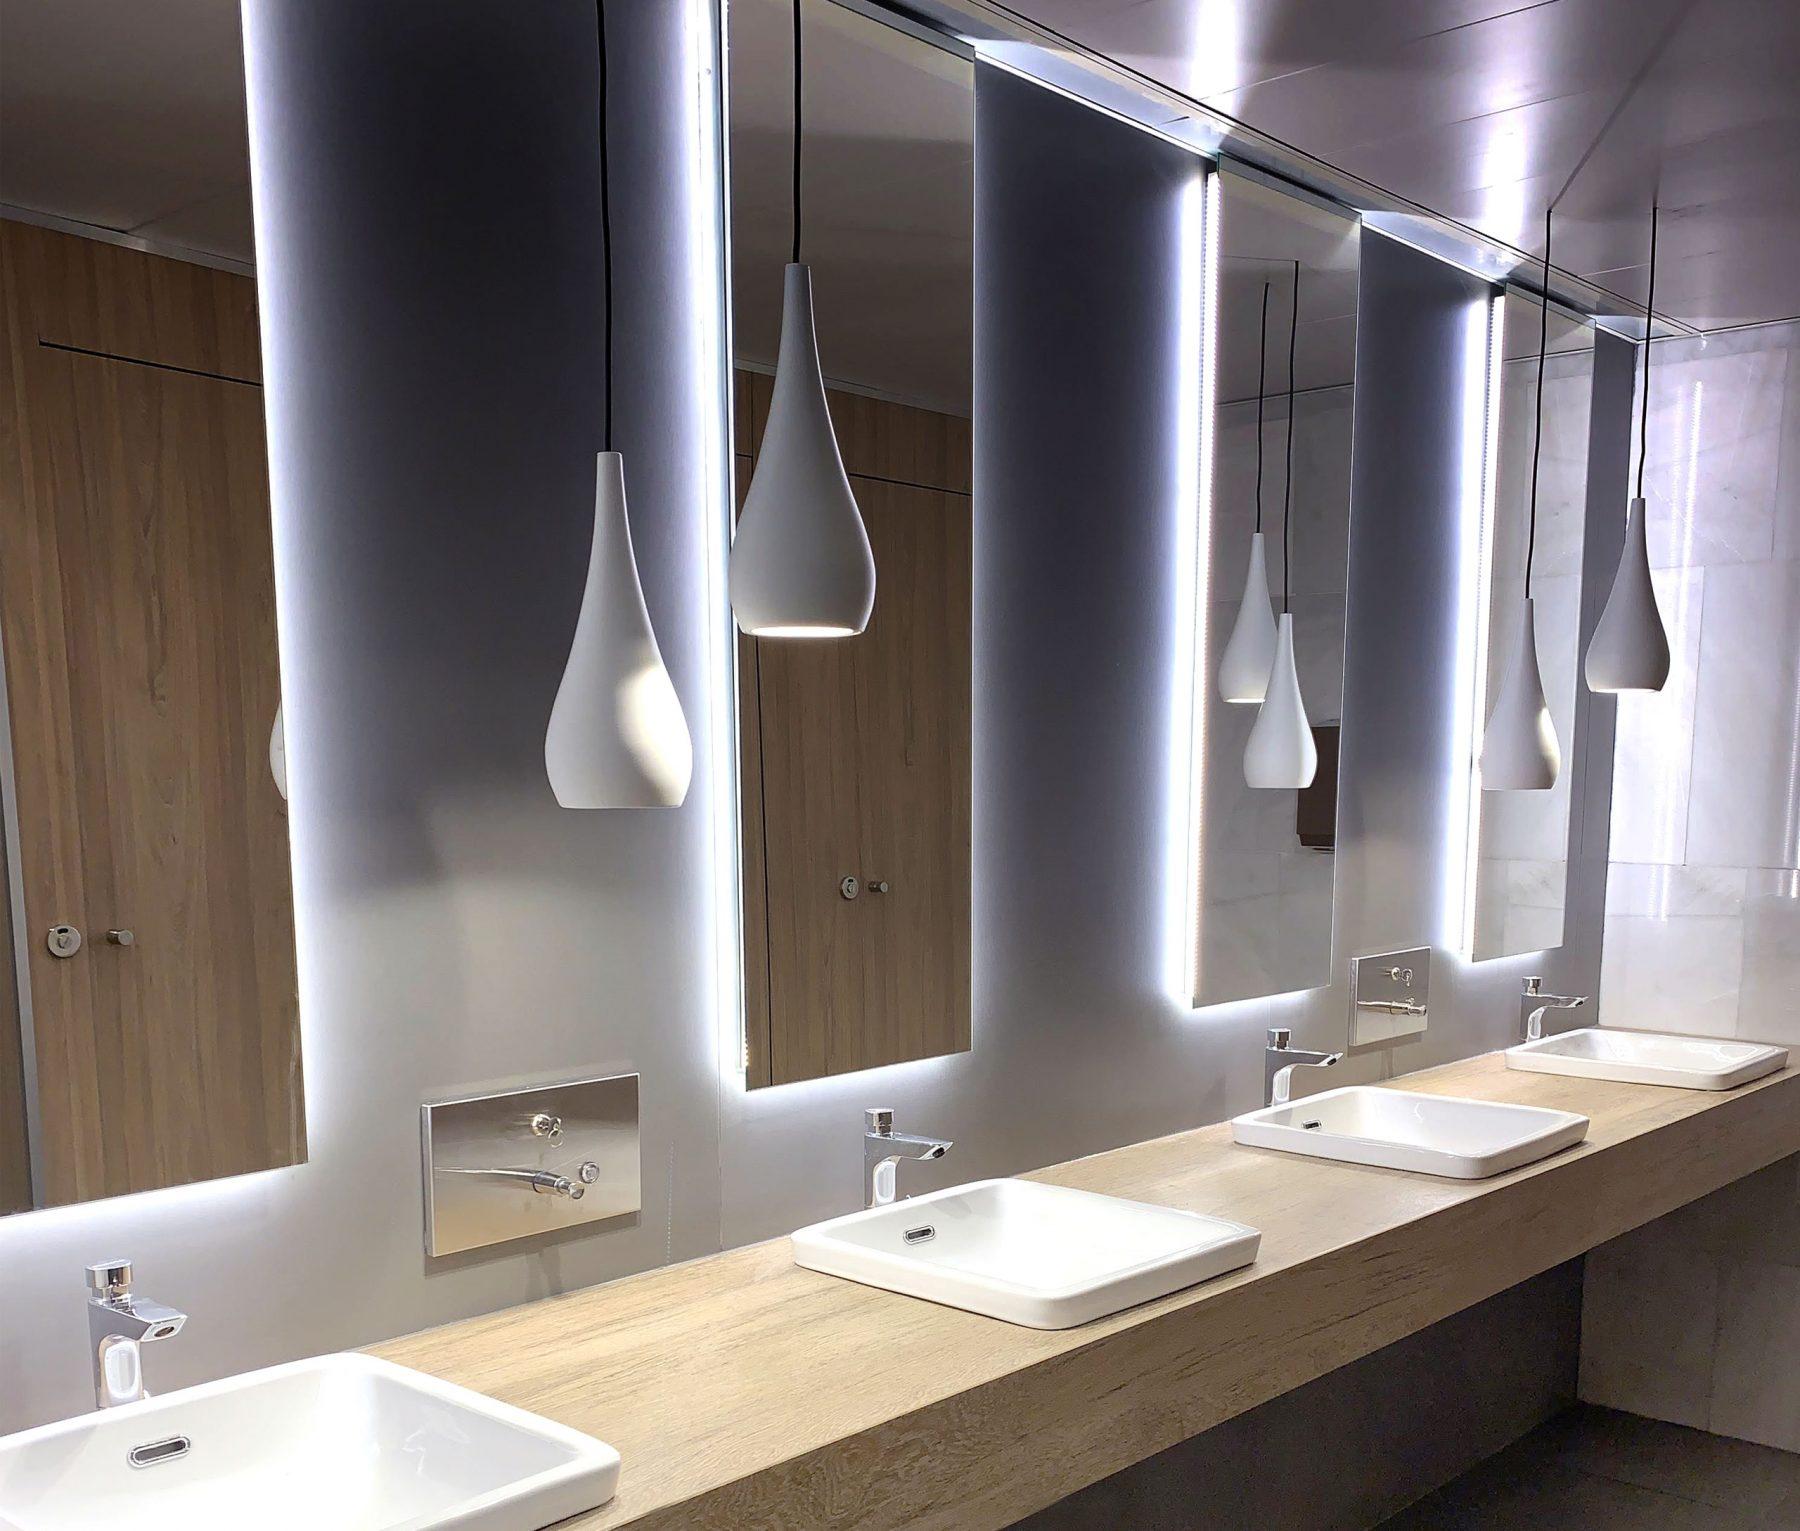 arquitectura_corporativa_diseno_interiores_lavabos_banos_wc_oficinas_encimera_consentino